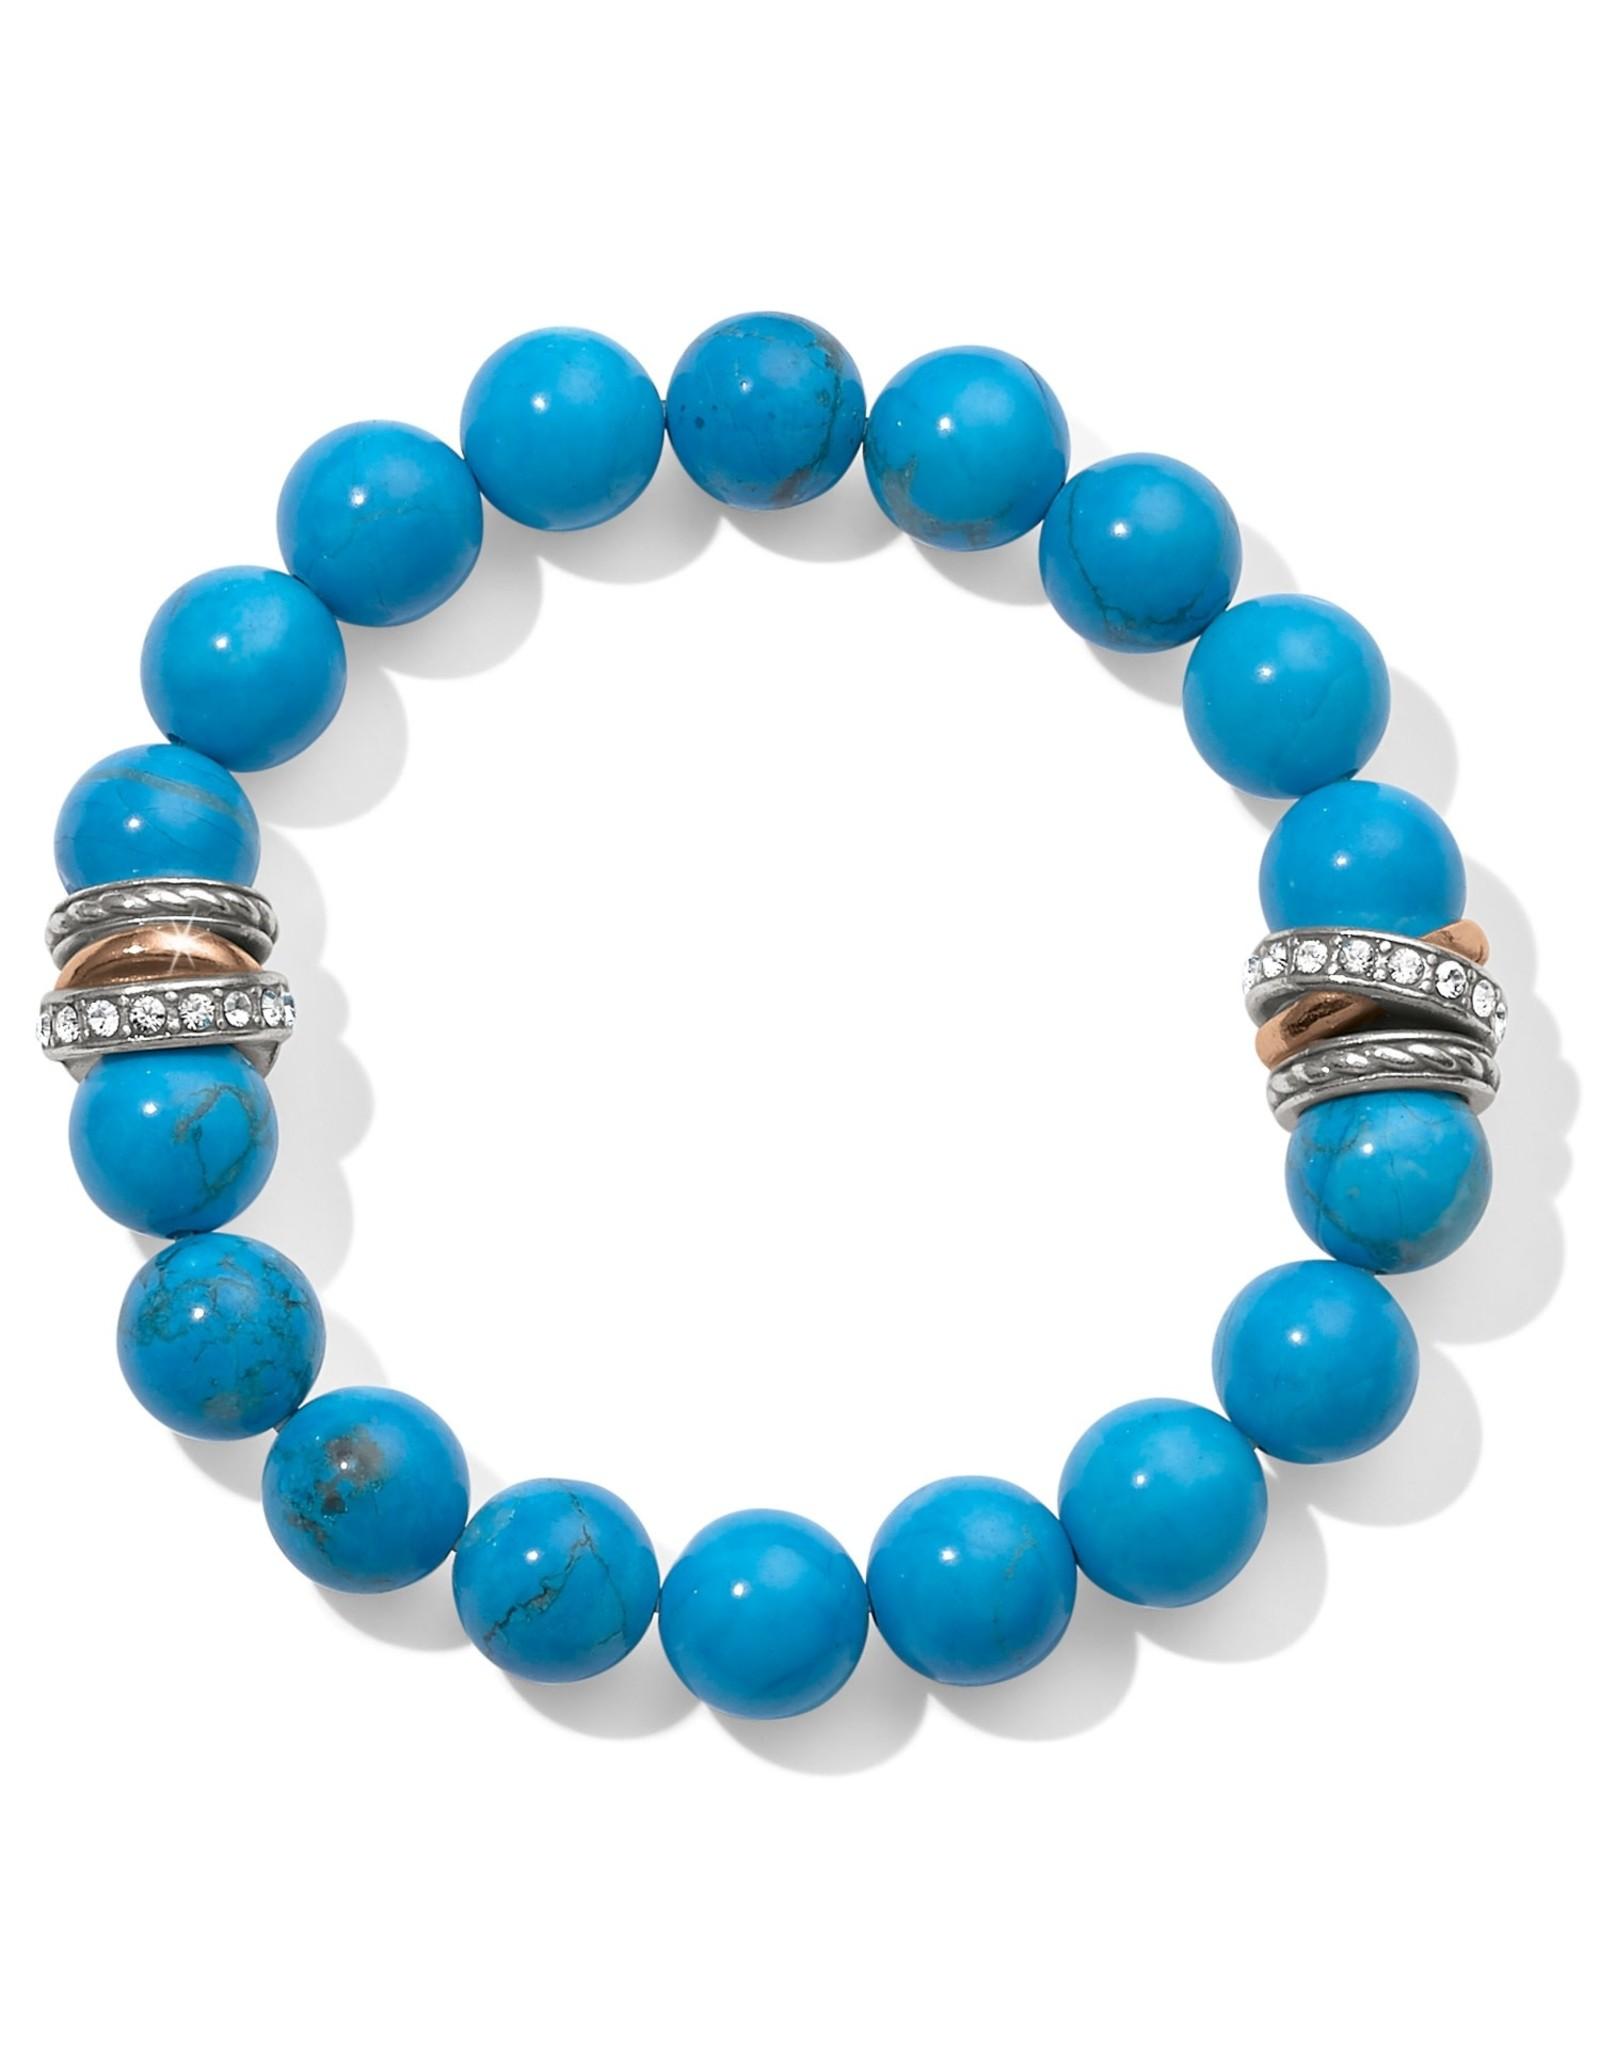 Brighton Neptunes Rings Turquoise Stretch Bracelet